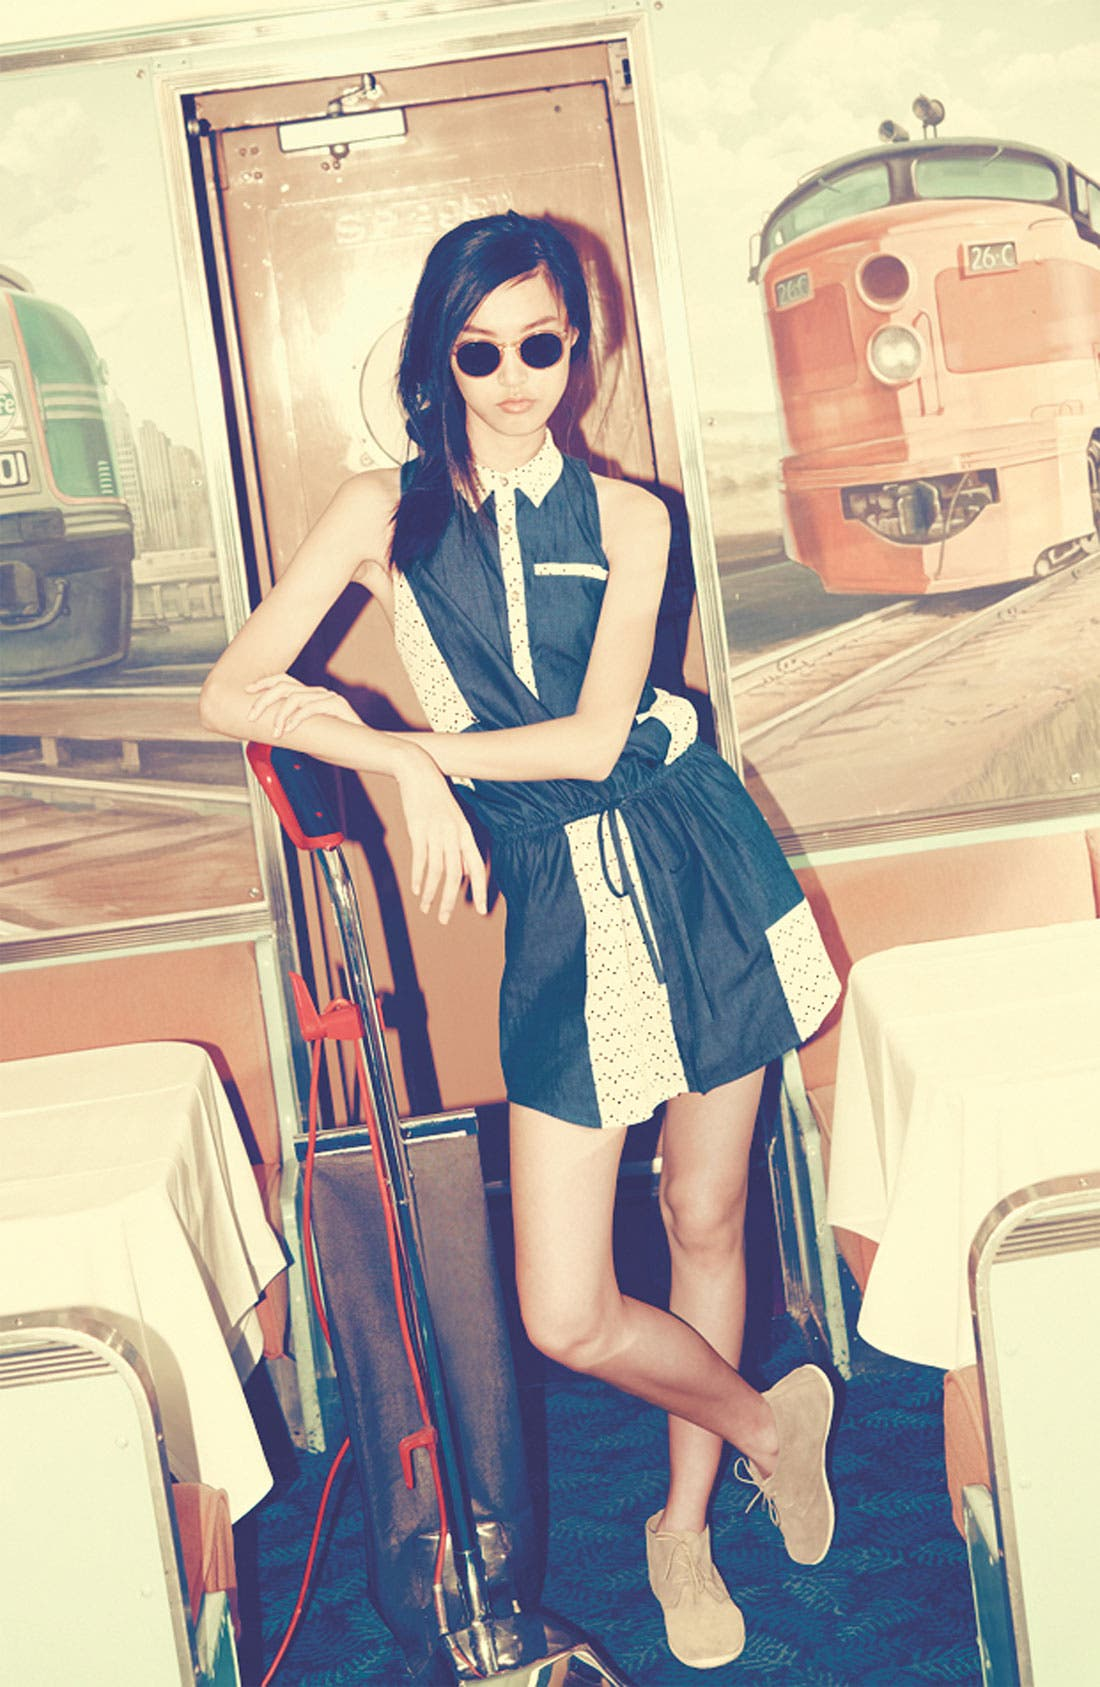 Alternate Image 1 Selected - Viva Vina! Dress & Accessories